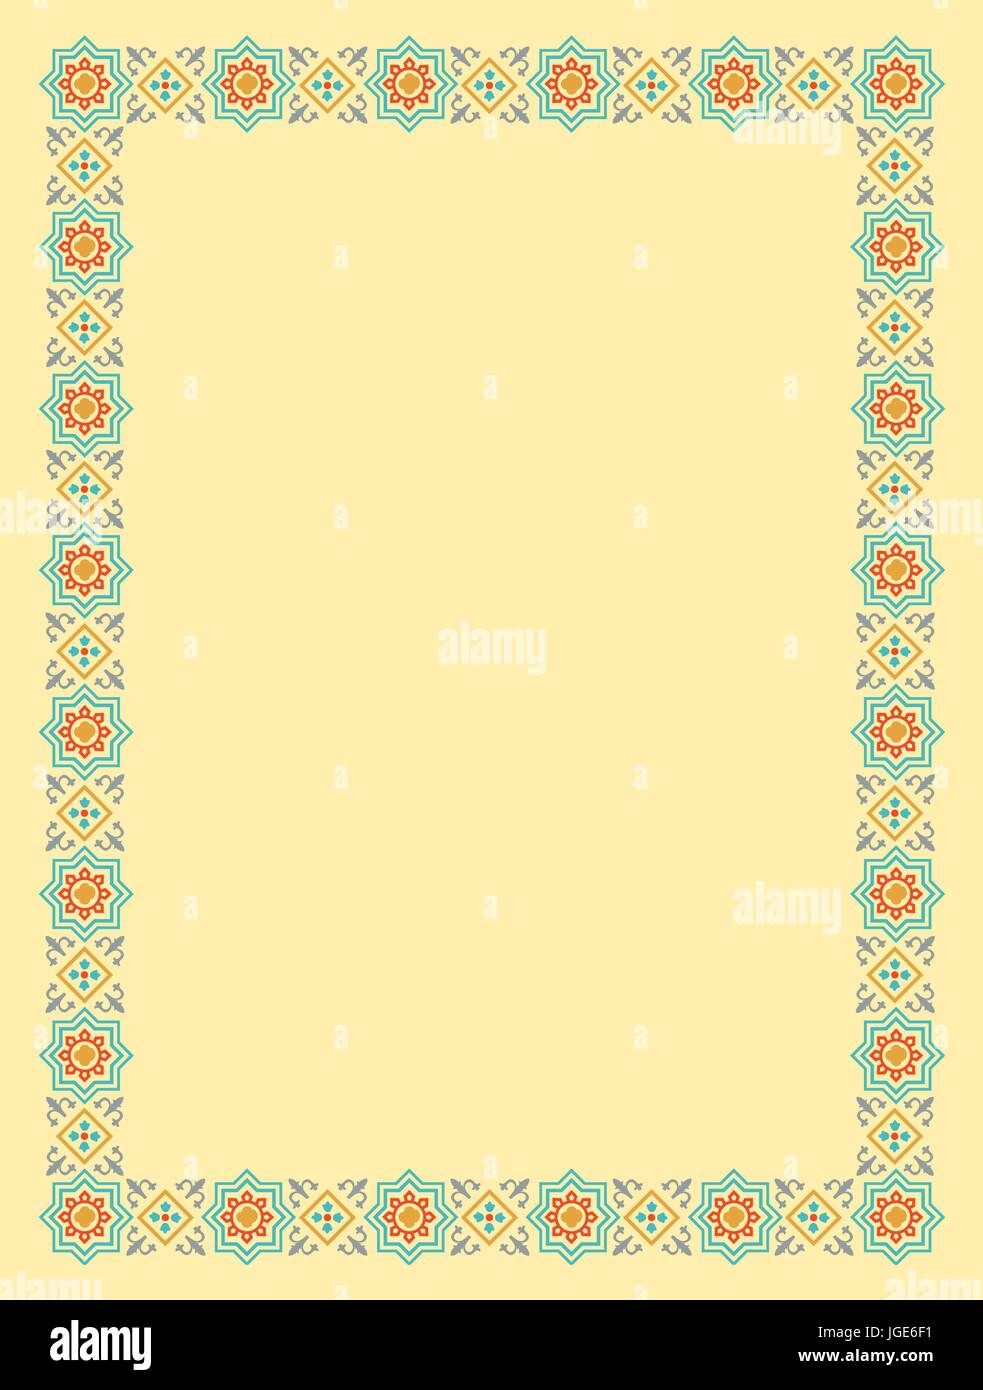 Frame & Border Islamic style Stock Vector Art & Illustration, Vector ...